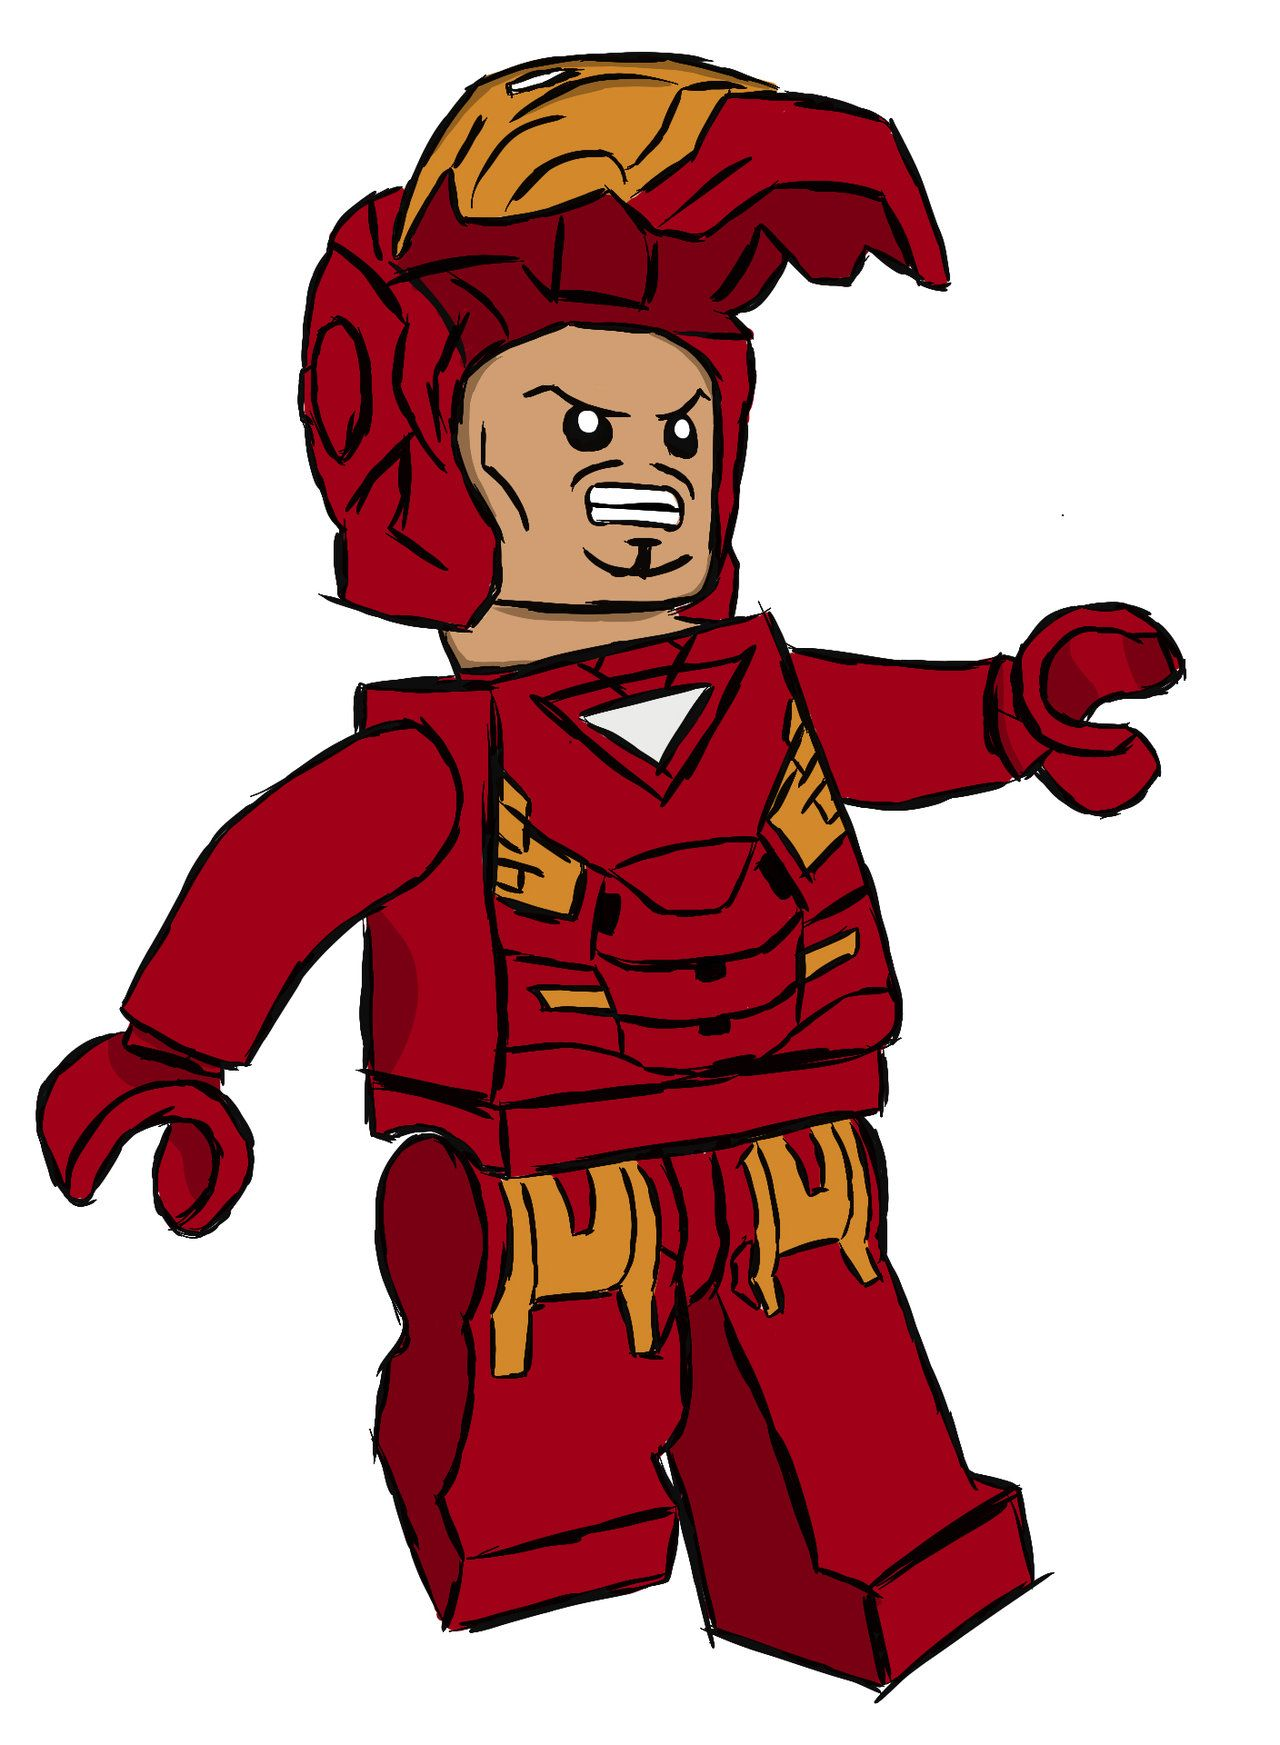 Lego Iron Man Drawing : drawing, Digital, Drawing, Enriquitio, DeviantART, Cartoon,, Drawing,